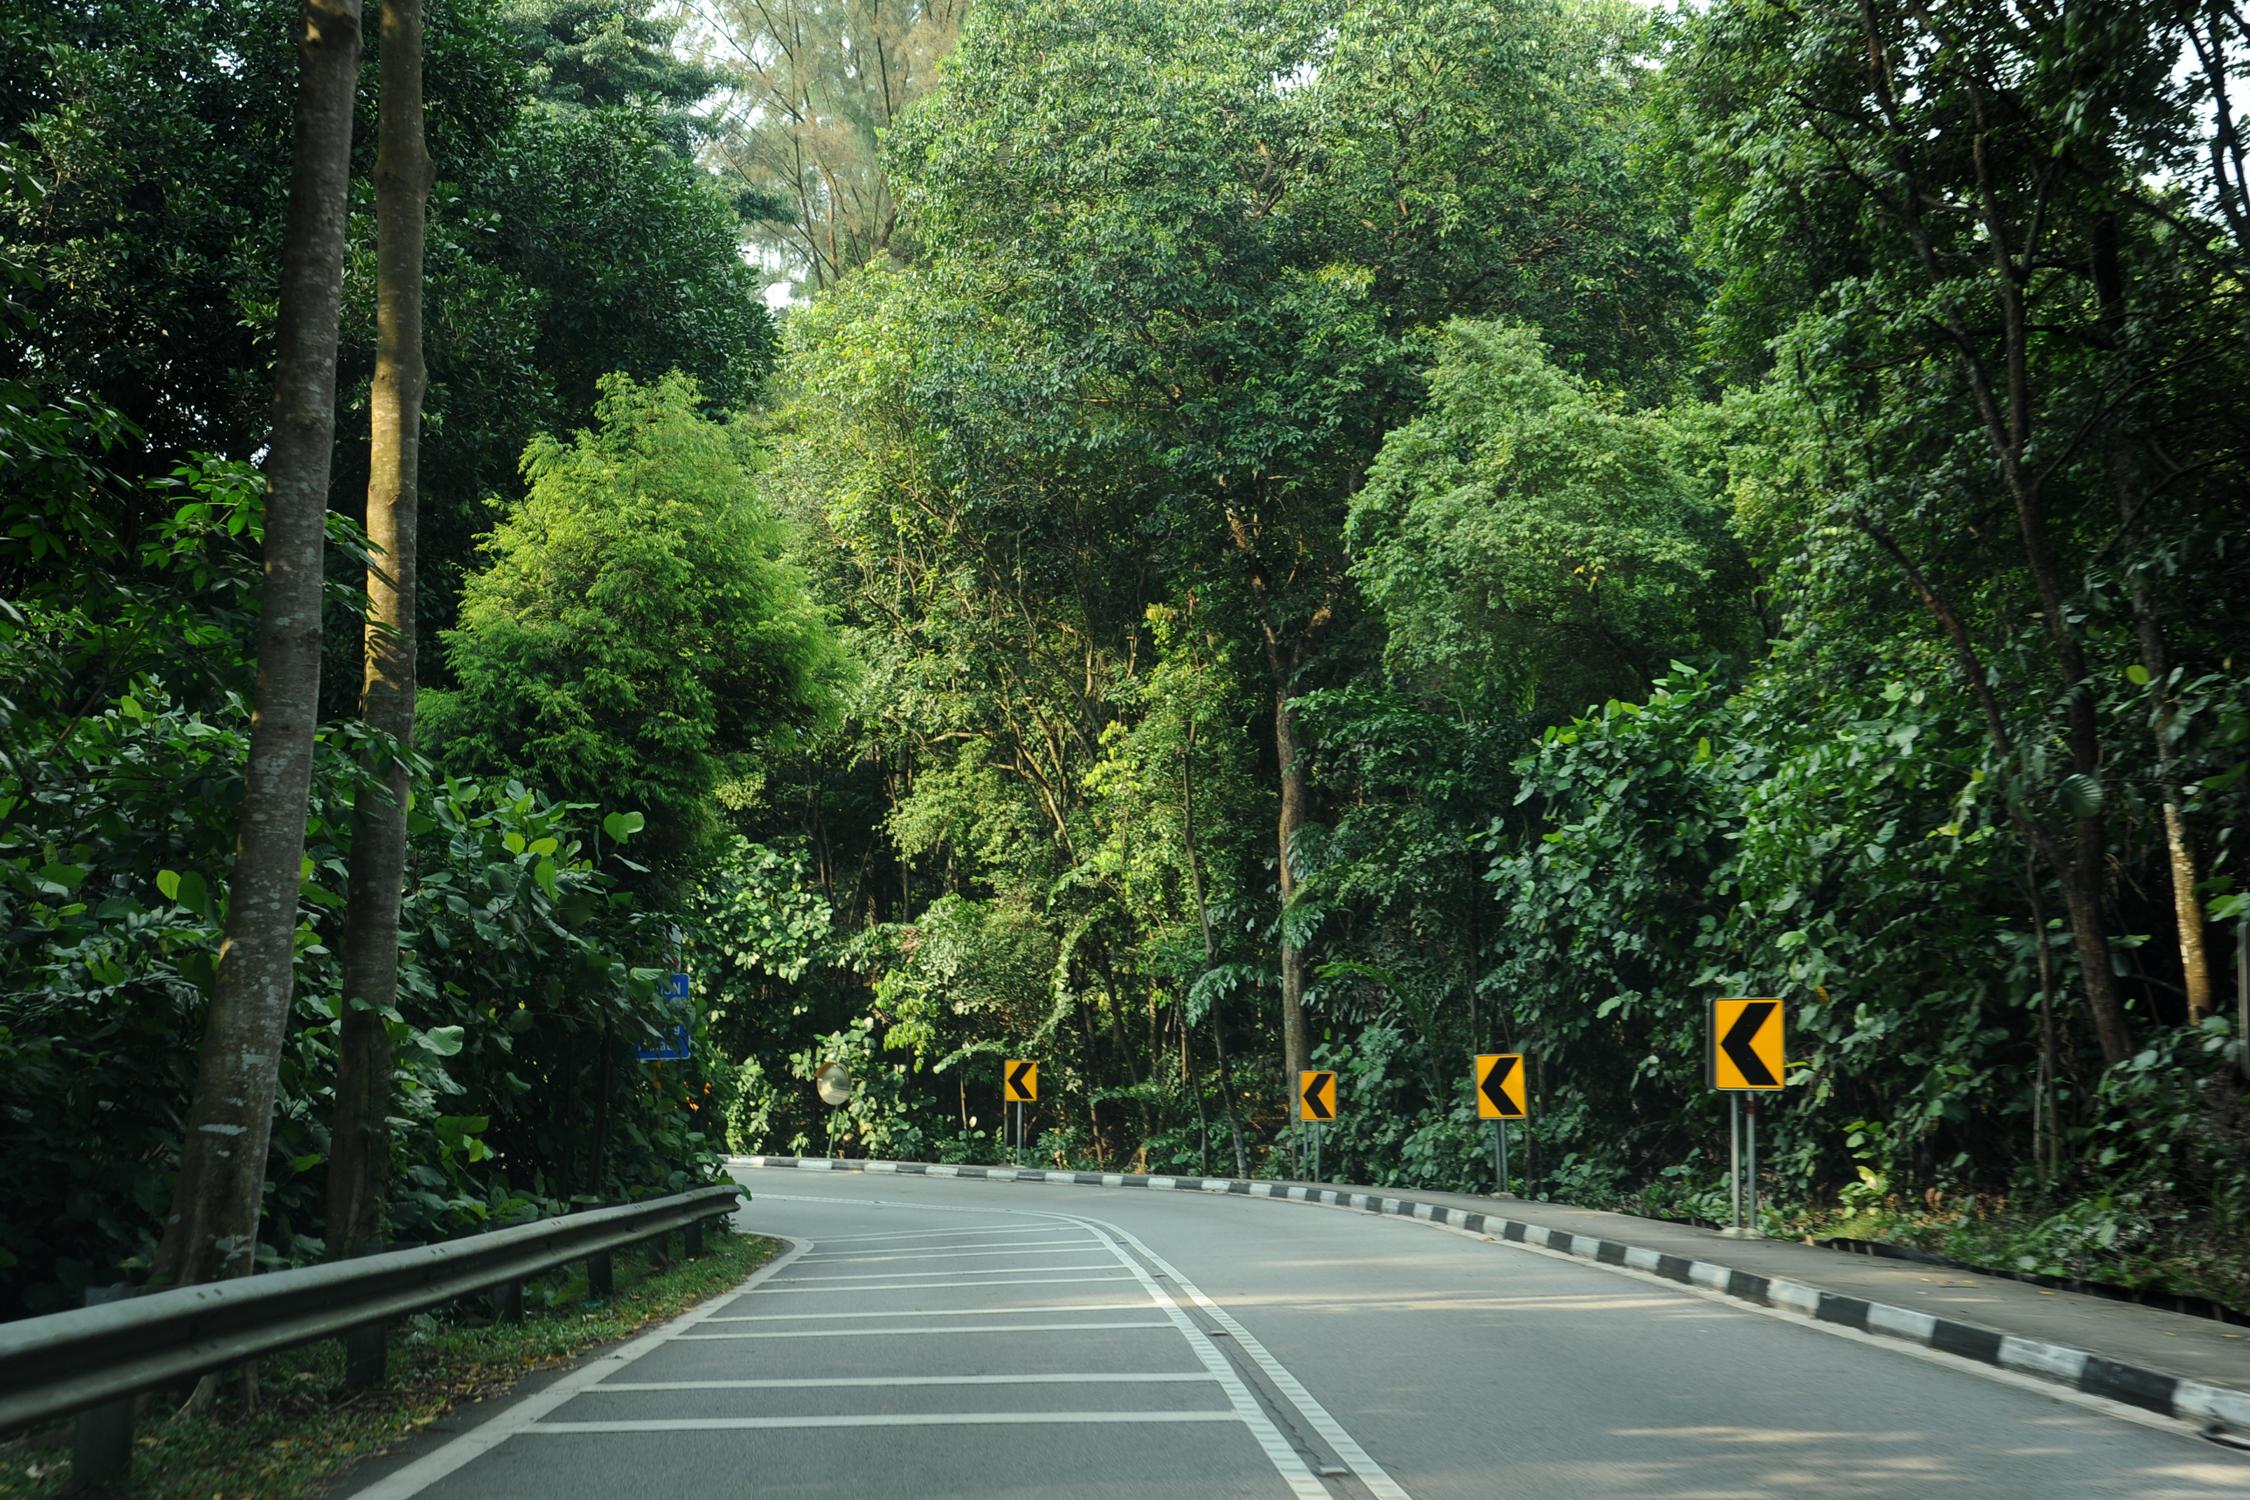 South Buona Vista Road